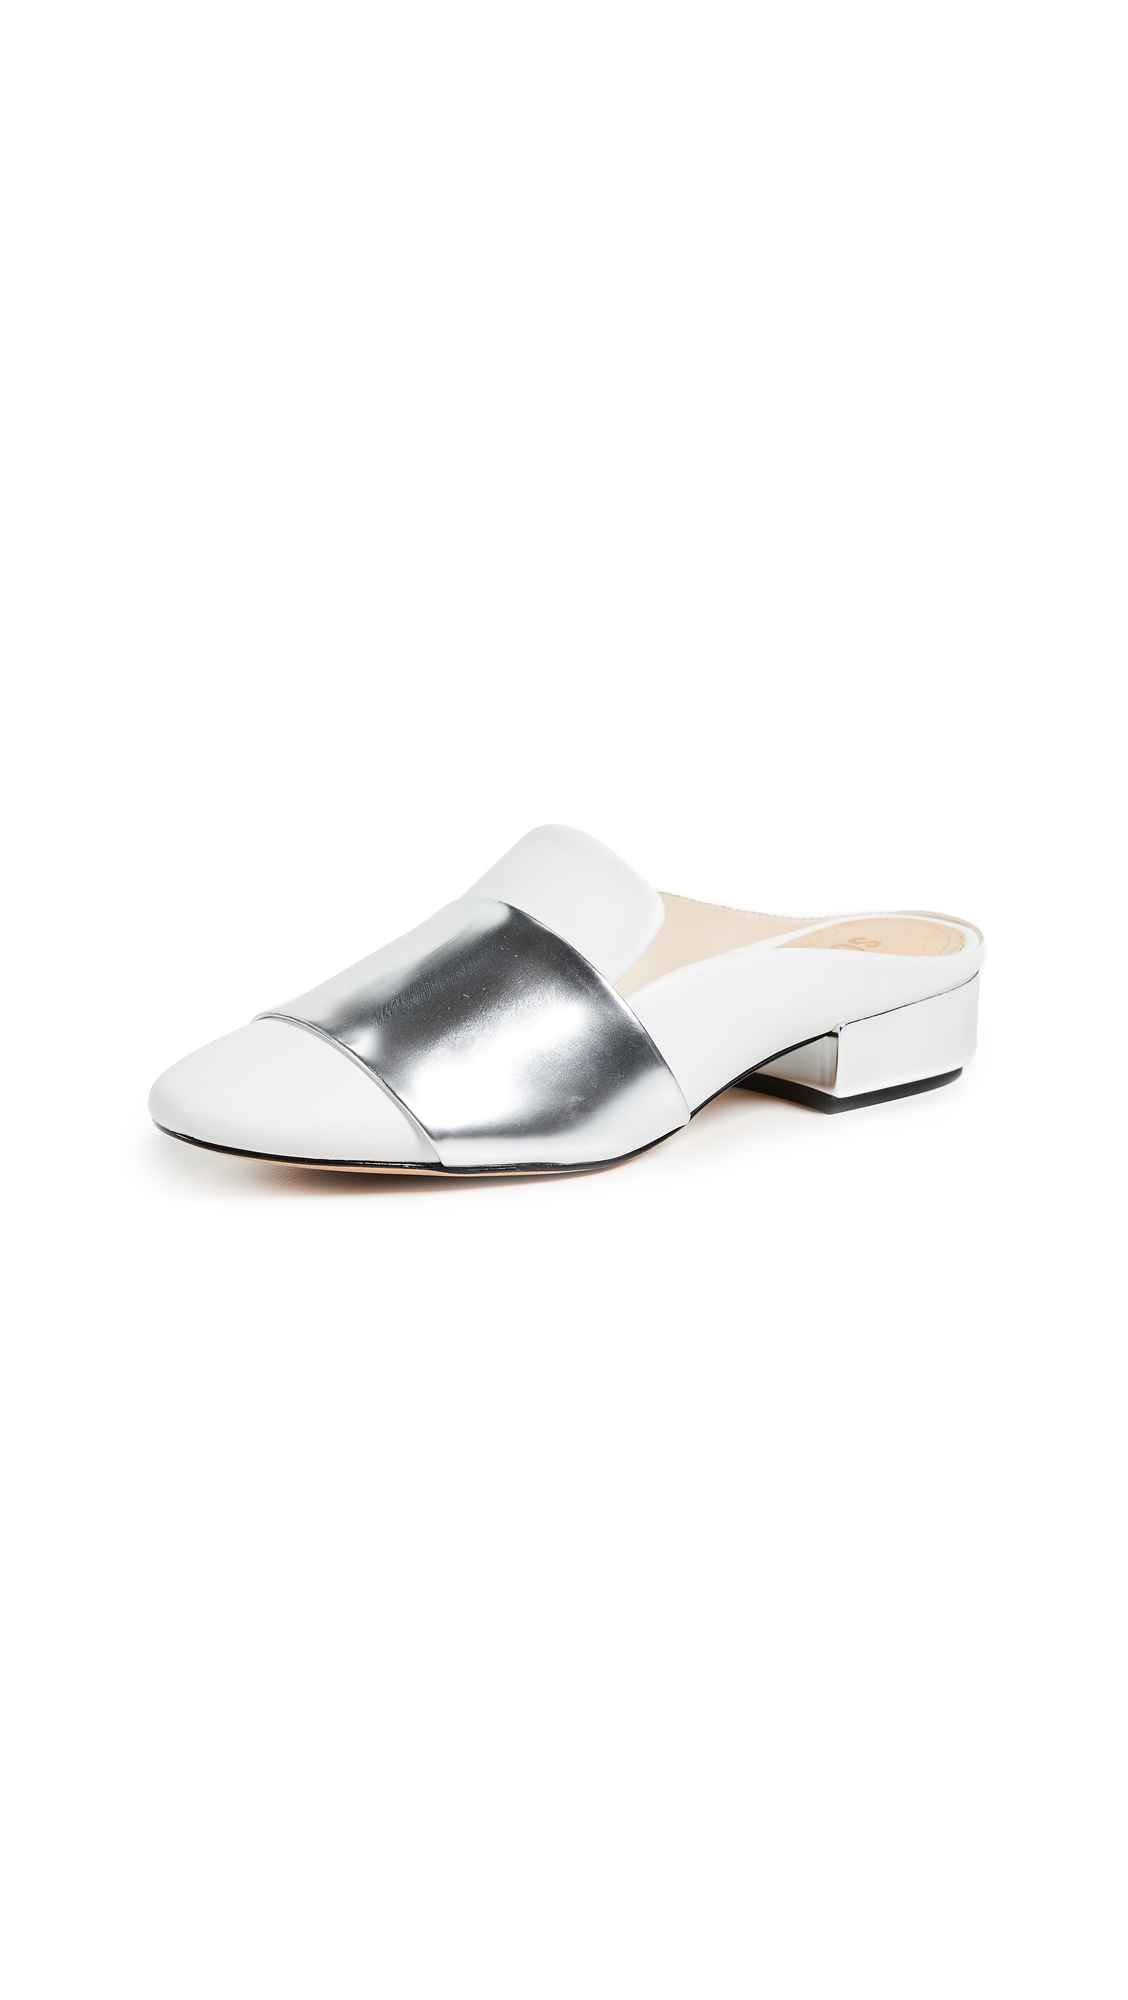 Schutz Eunice Mules - White/Silver